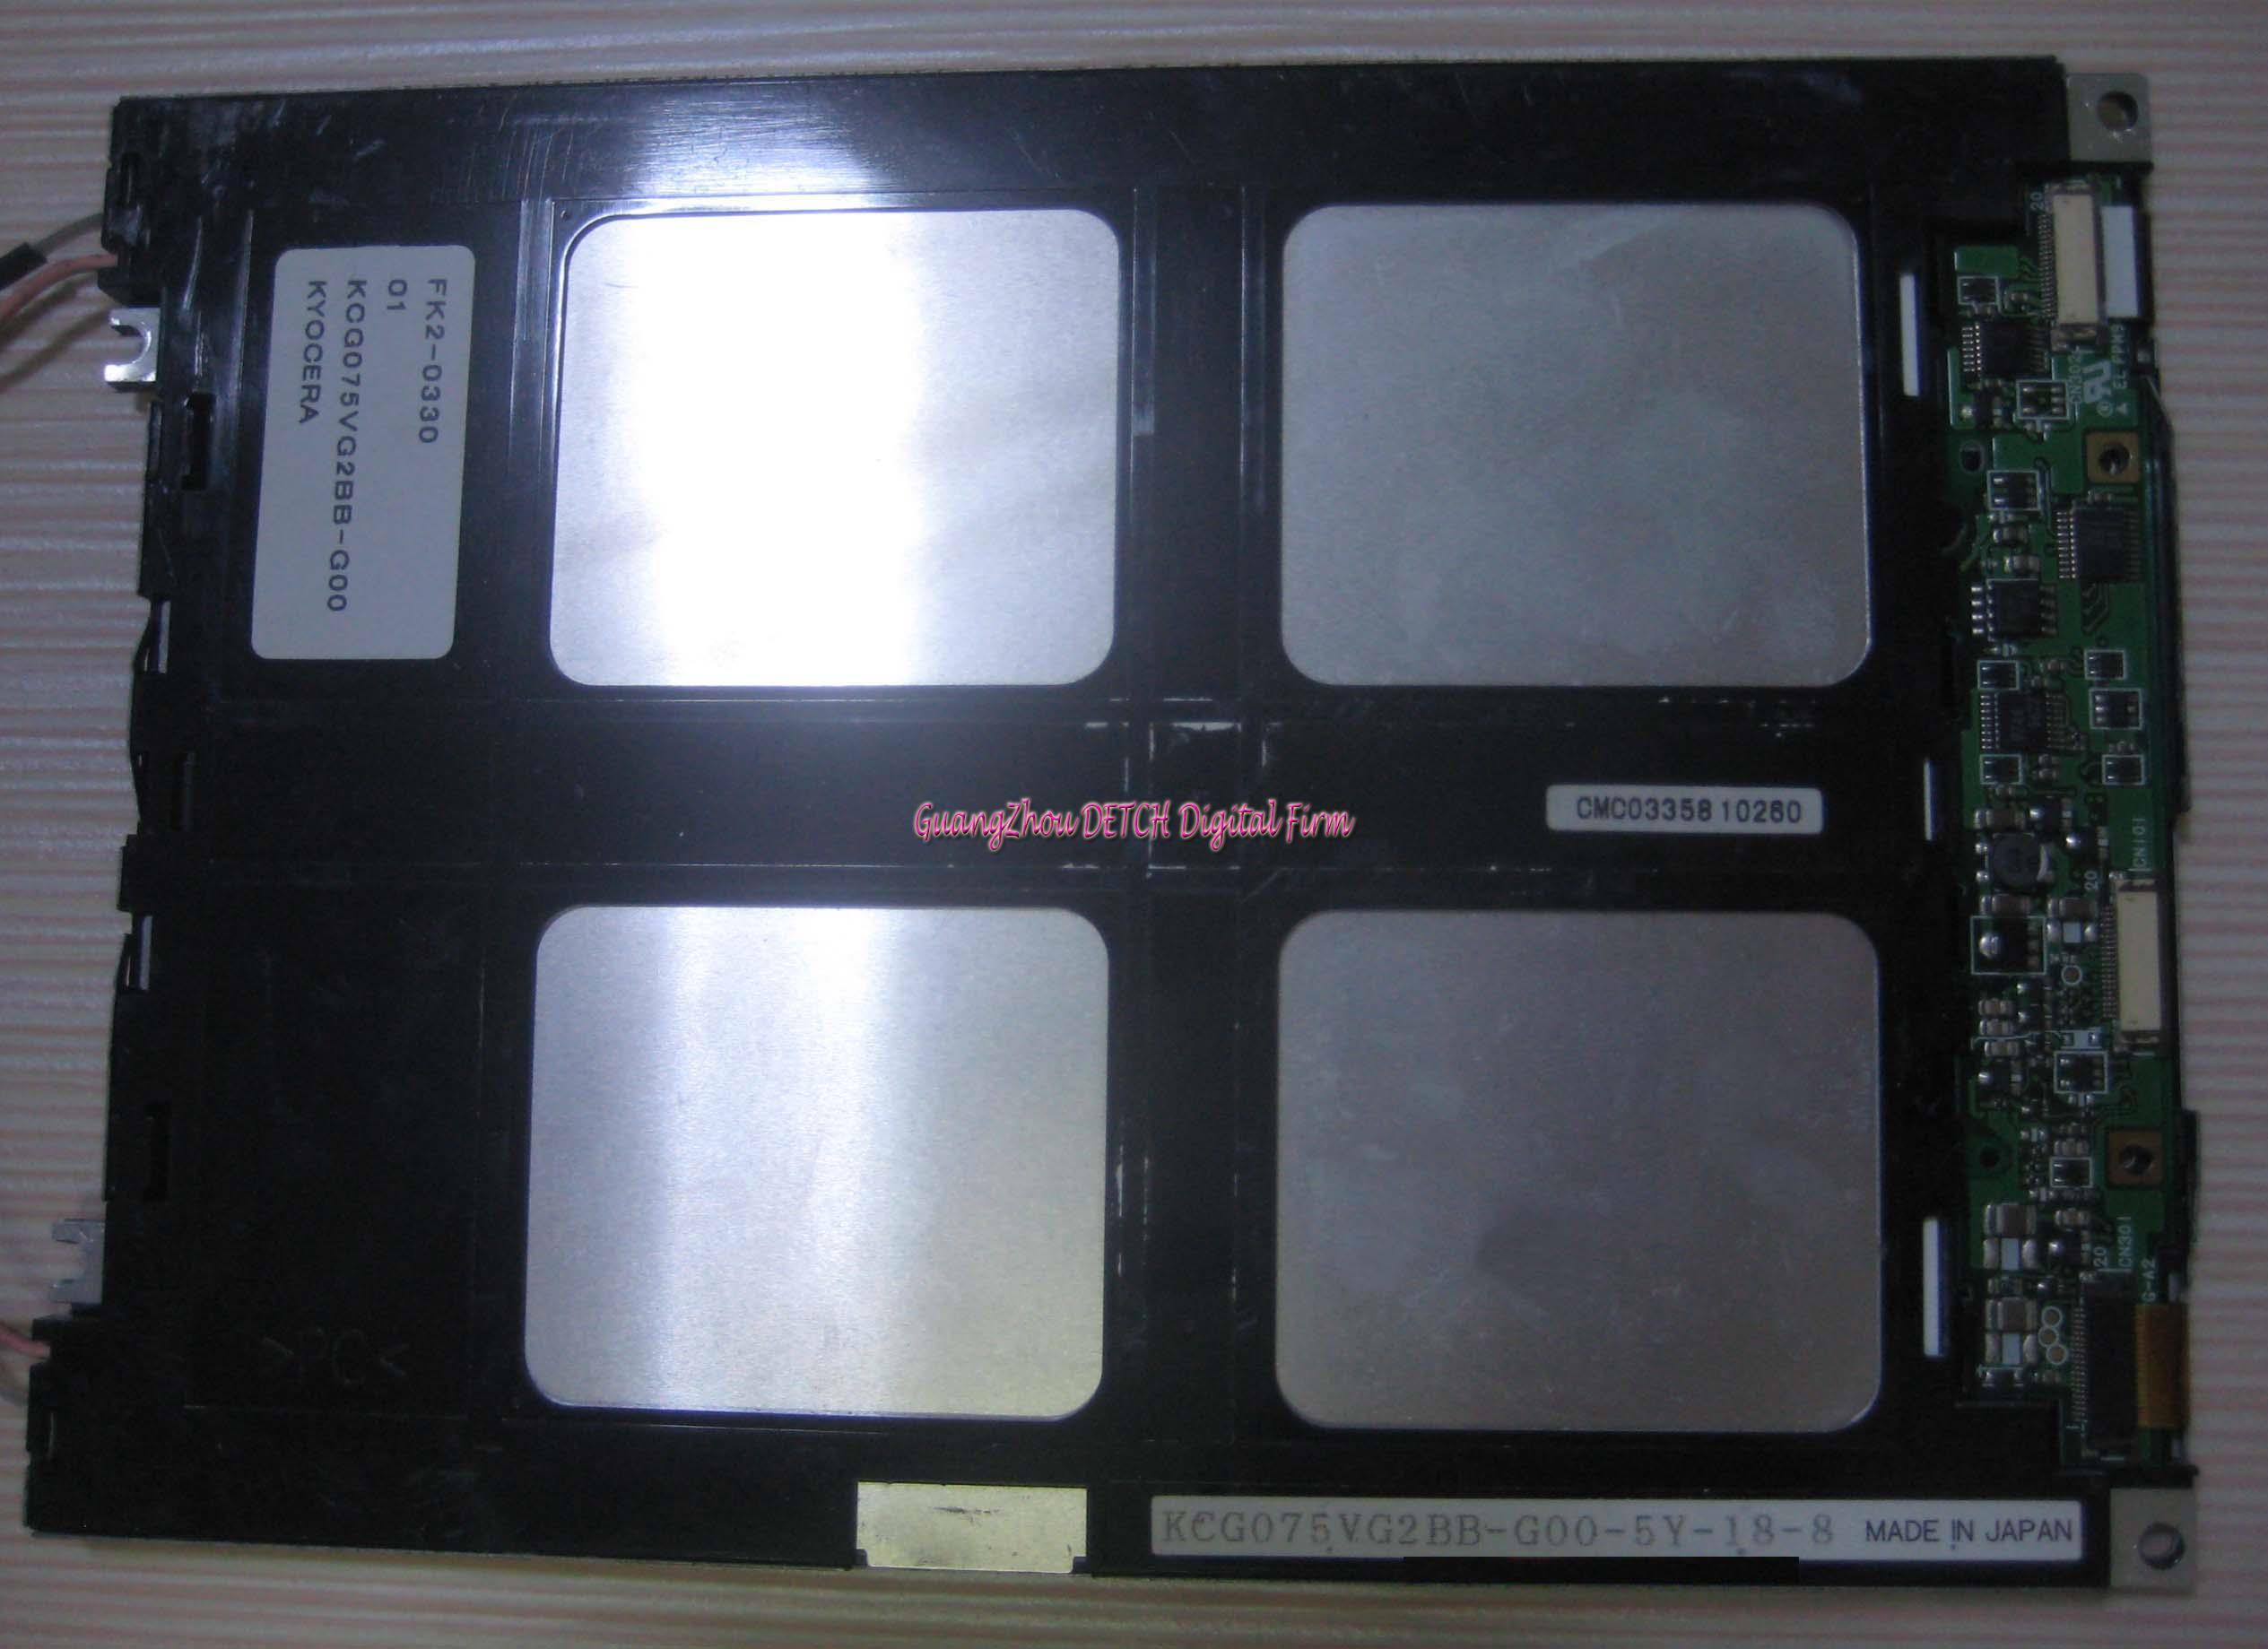 Industrial display LCD screen7.5-inch  KCG075VG2BP-G00  LCD screen  LCD screen lc150x01 sl01 lc150x01 sl 01 lcd display screens